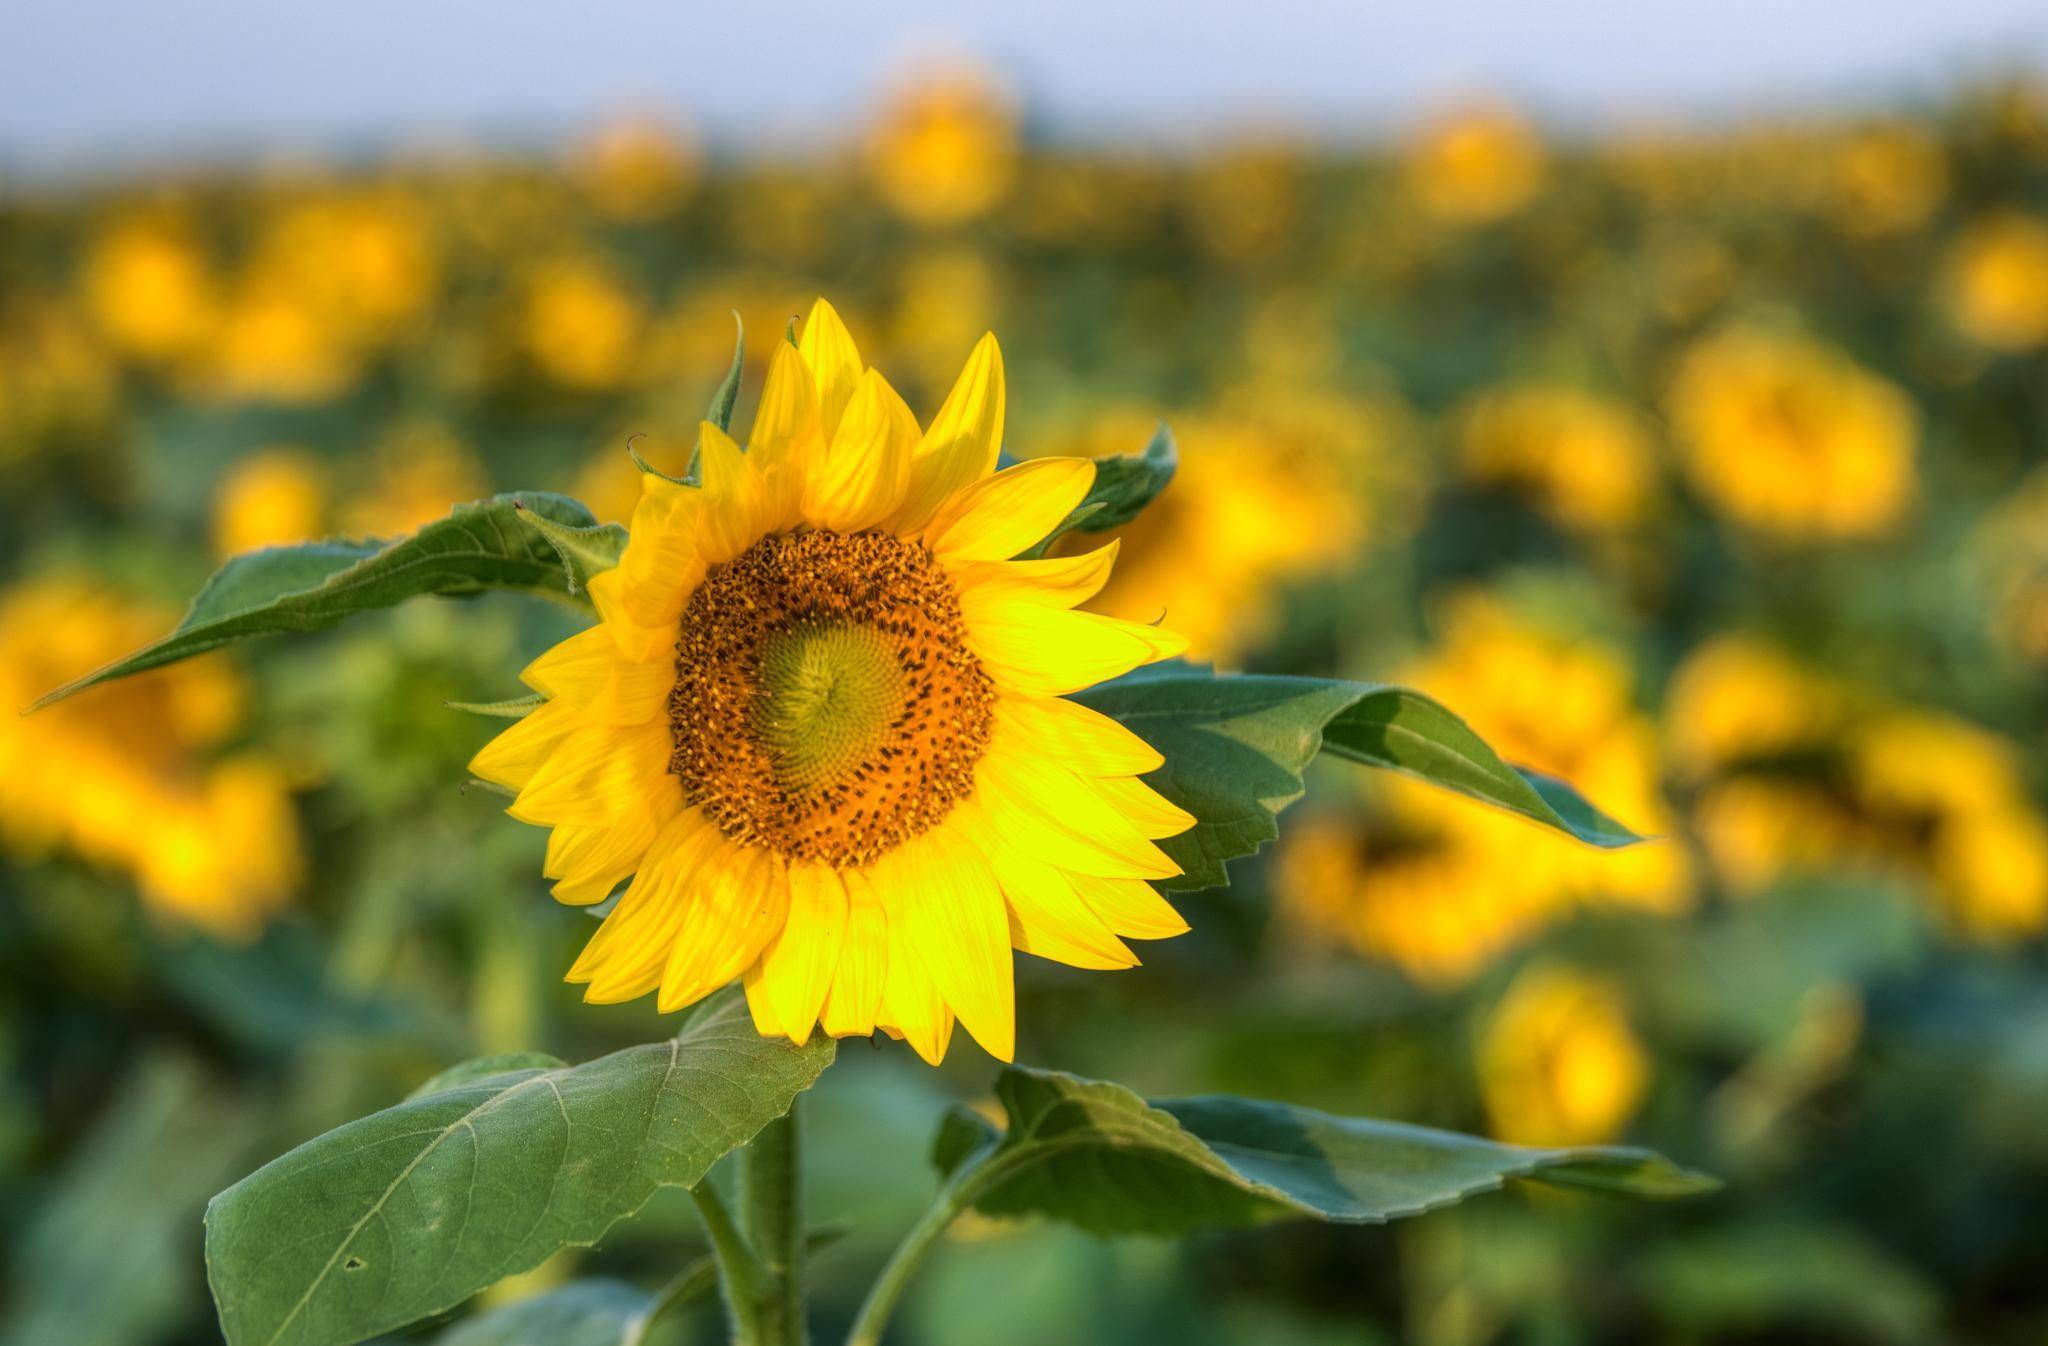 Field of Sunflowers by Jim Talbert